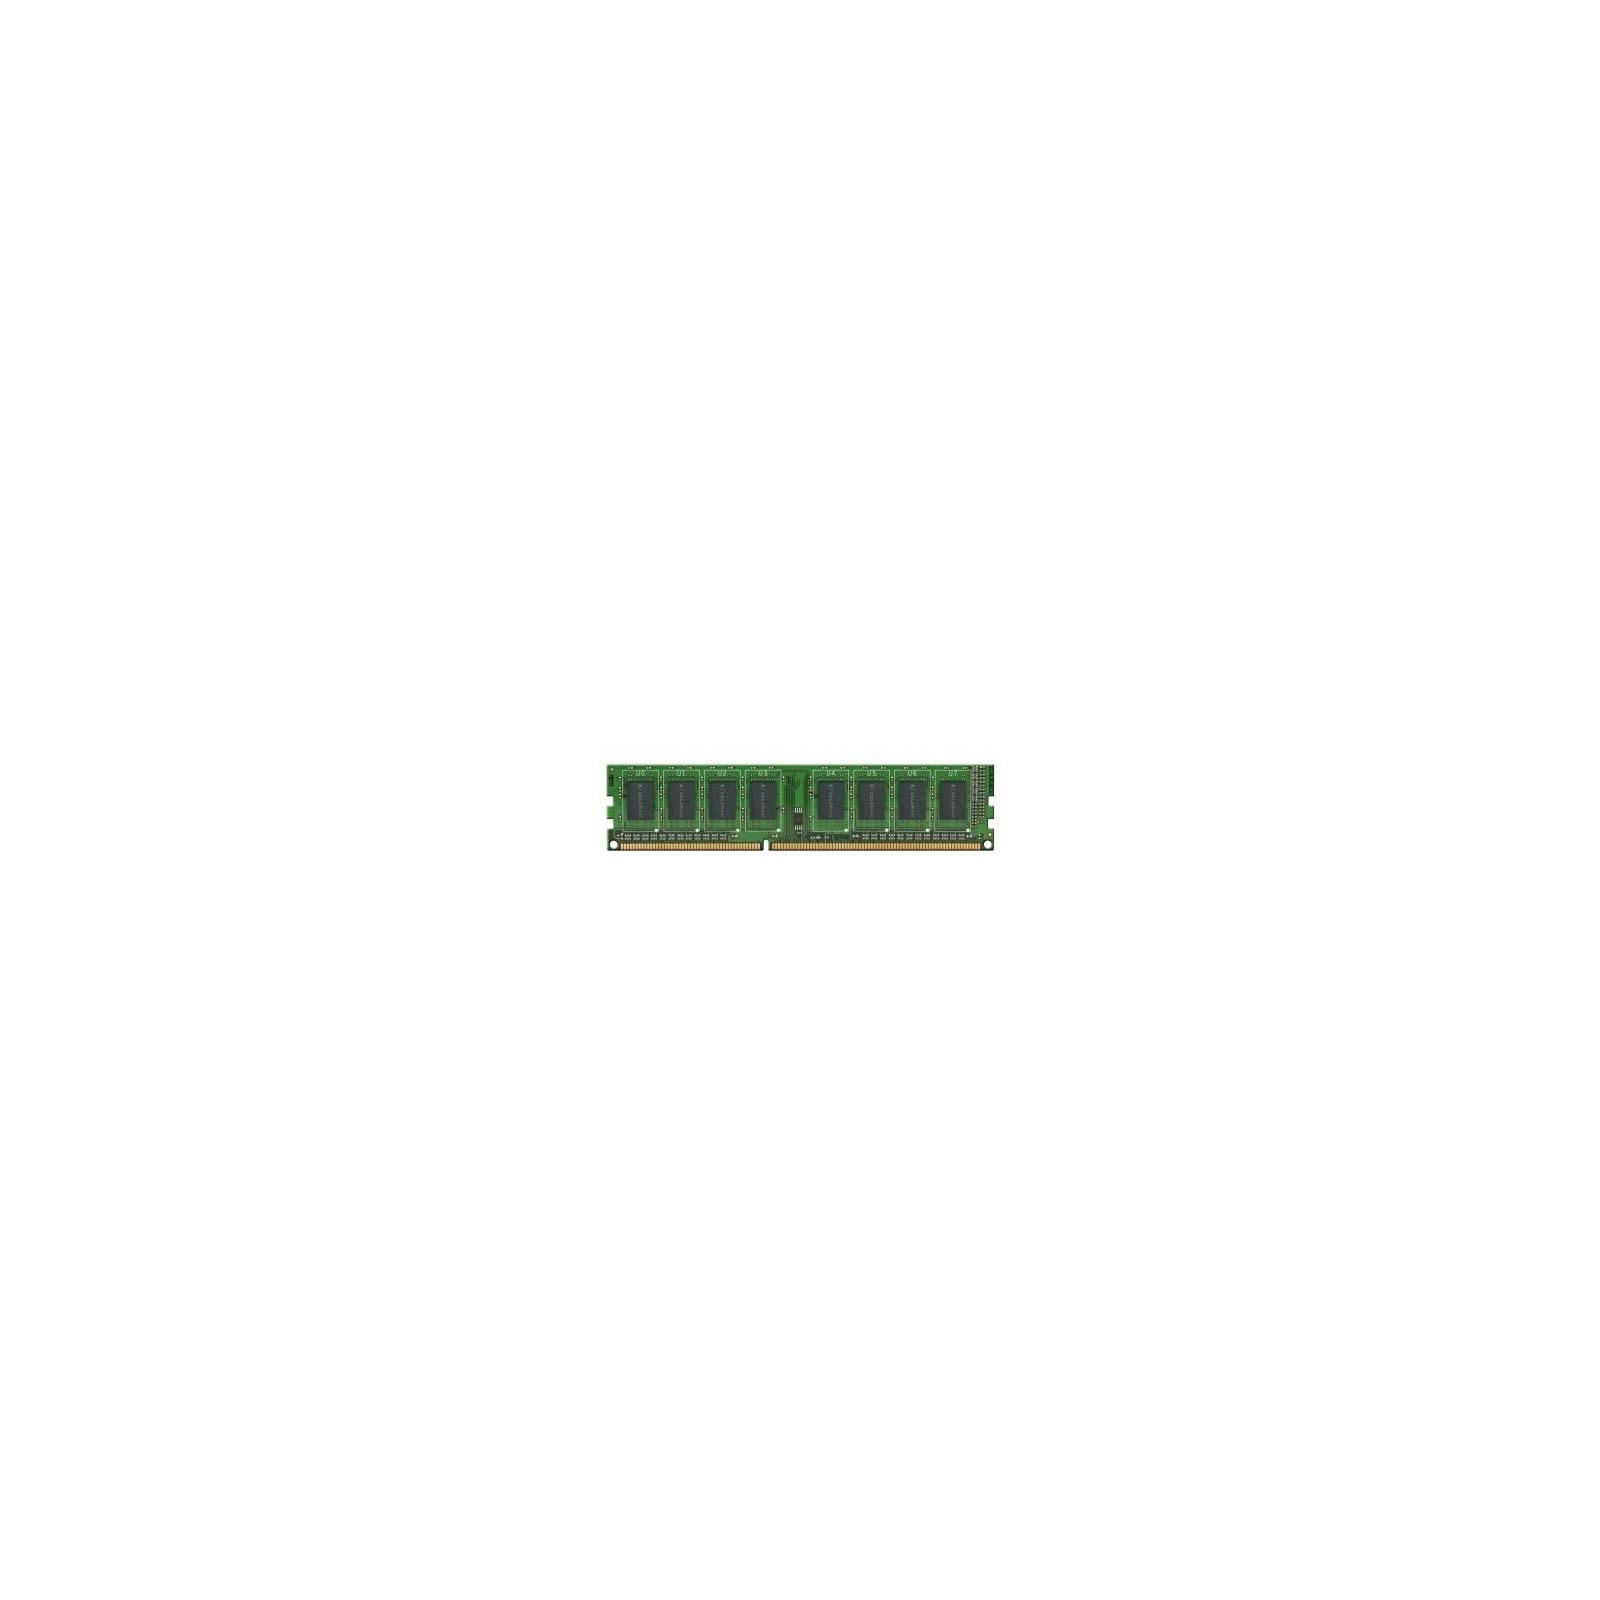 Модуль памяти для компьютера DDR3 4GB 1600 MHz Hynix (3rd)